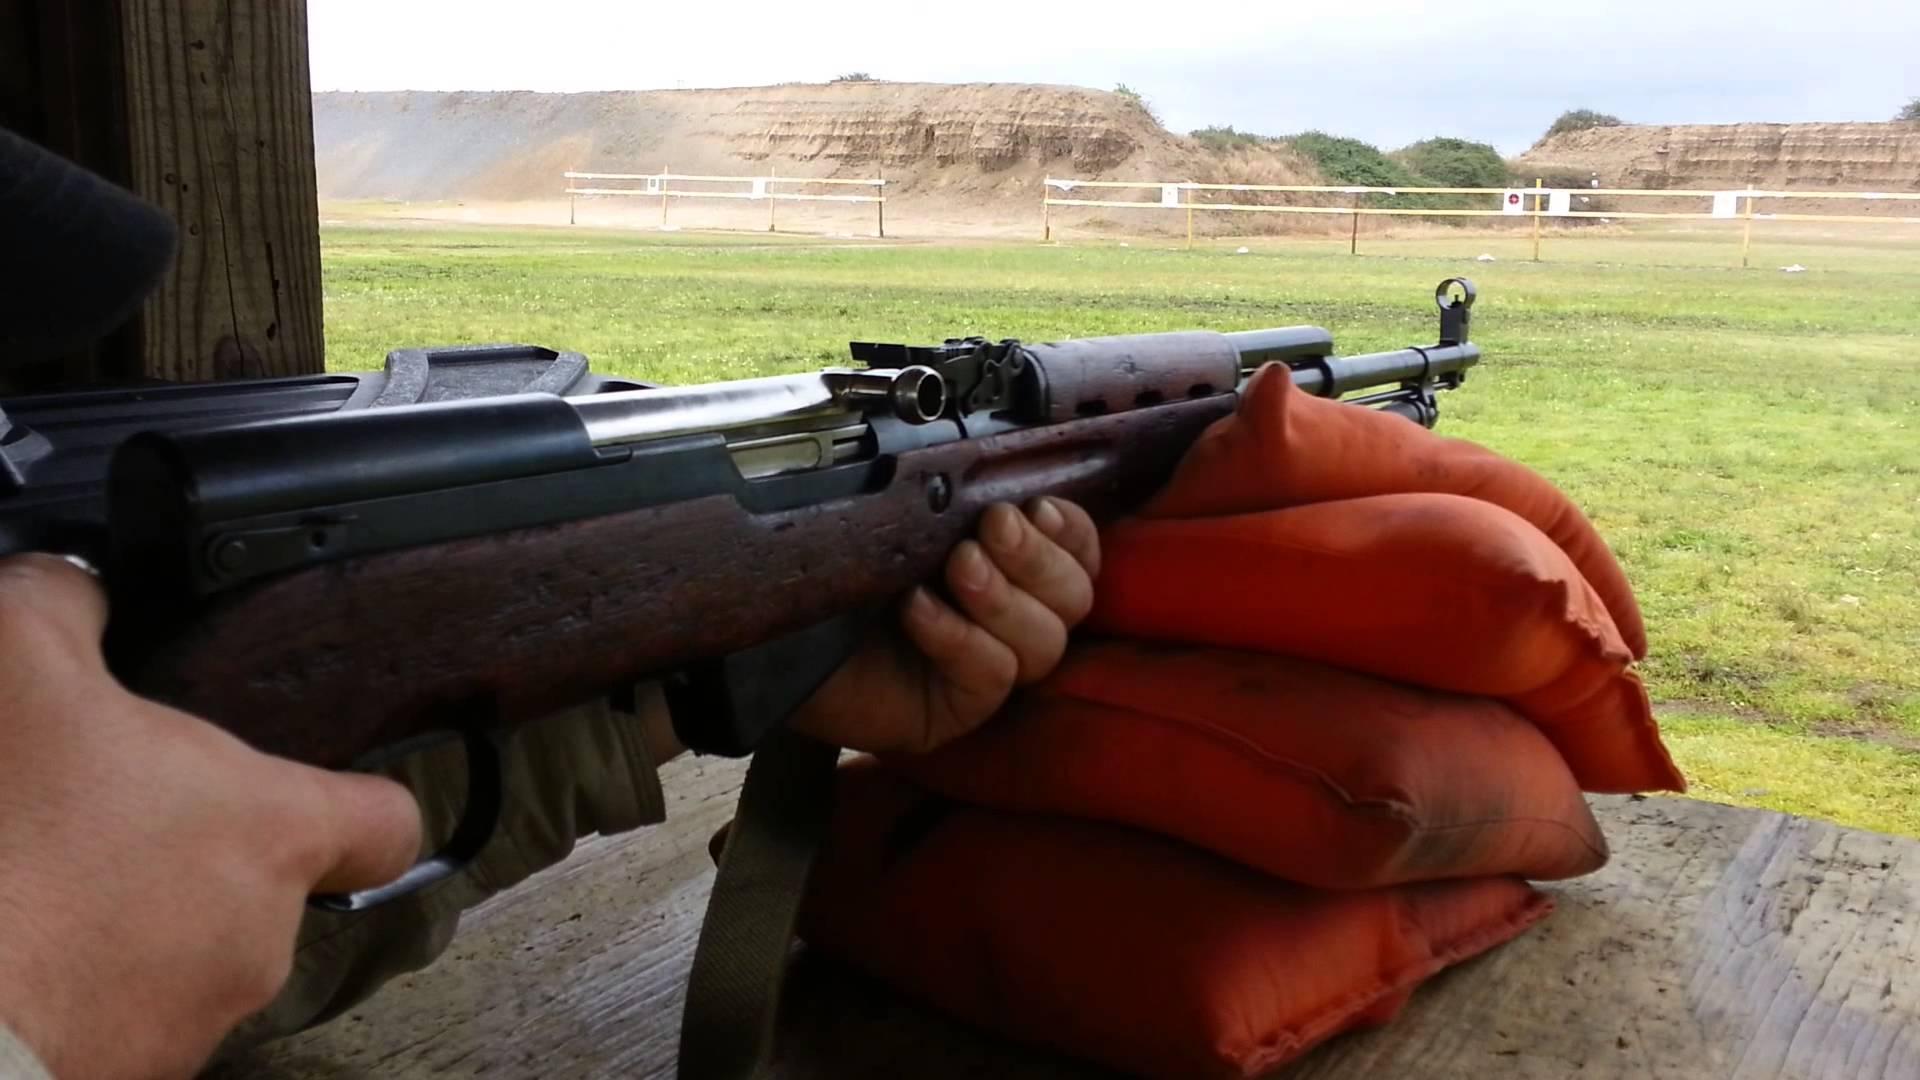 Chinese SKS Surplus 7.62x39 Rifle